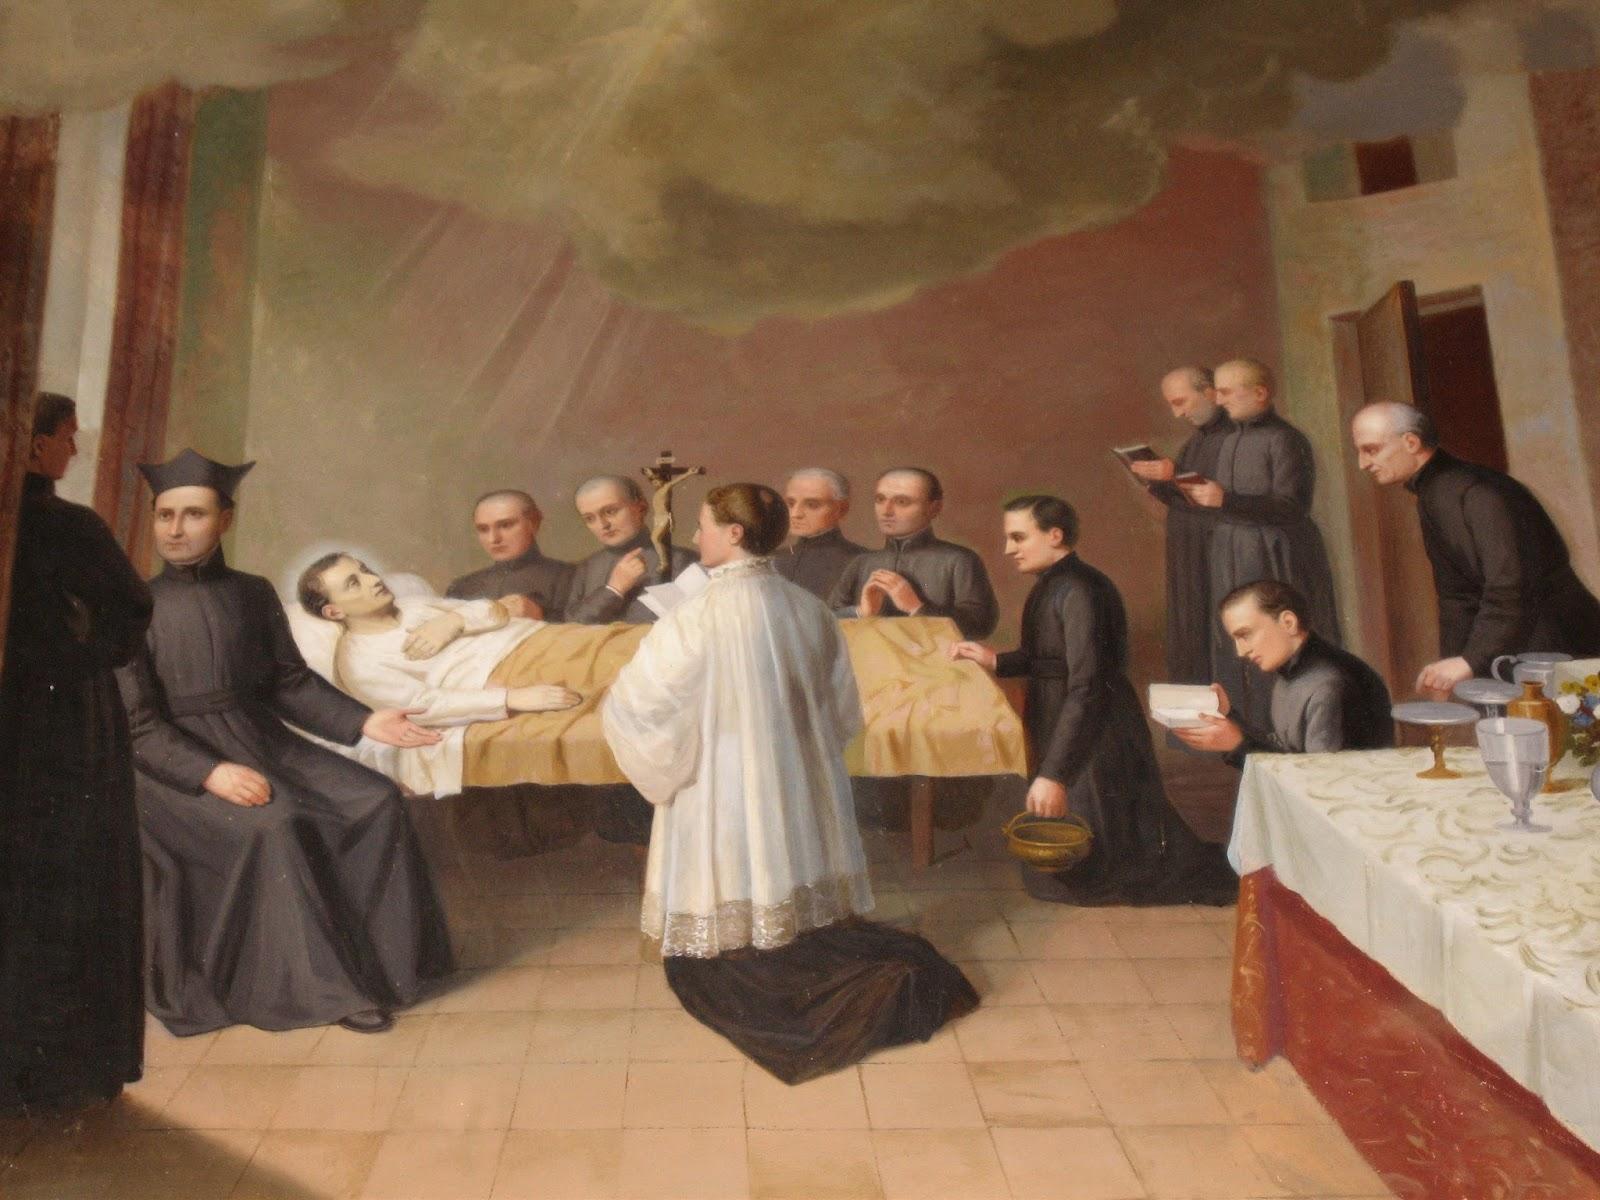 muerte de San Luis Gonzaga-San Luis Gonzaga Quito Ecuador